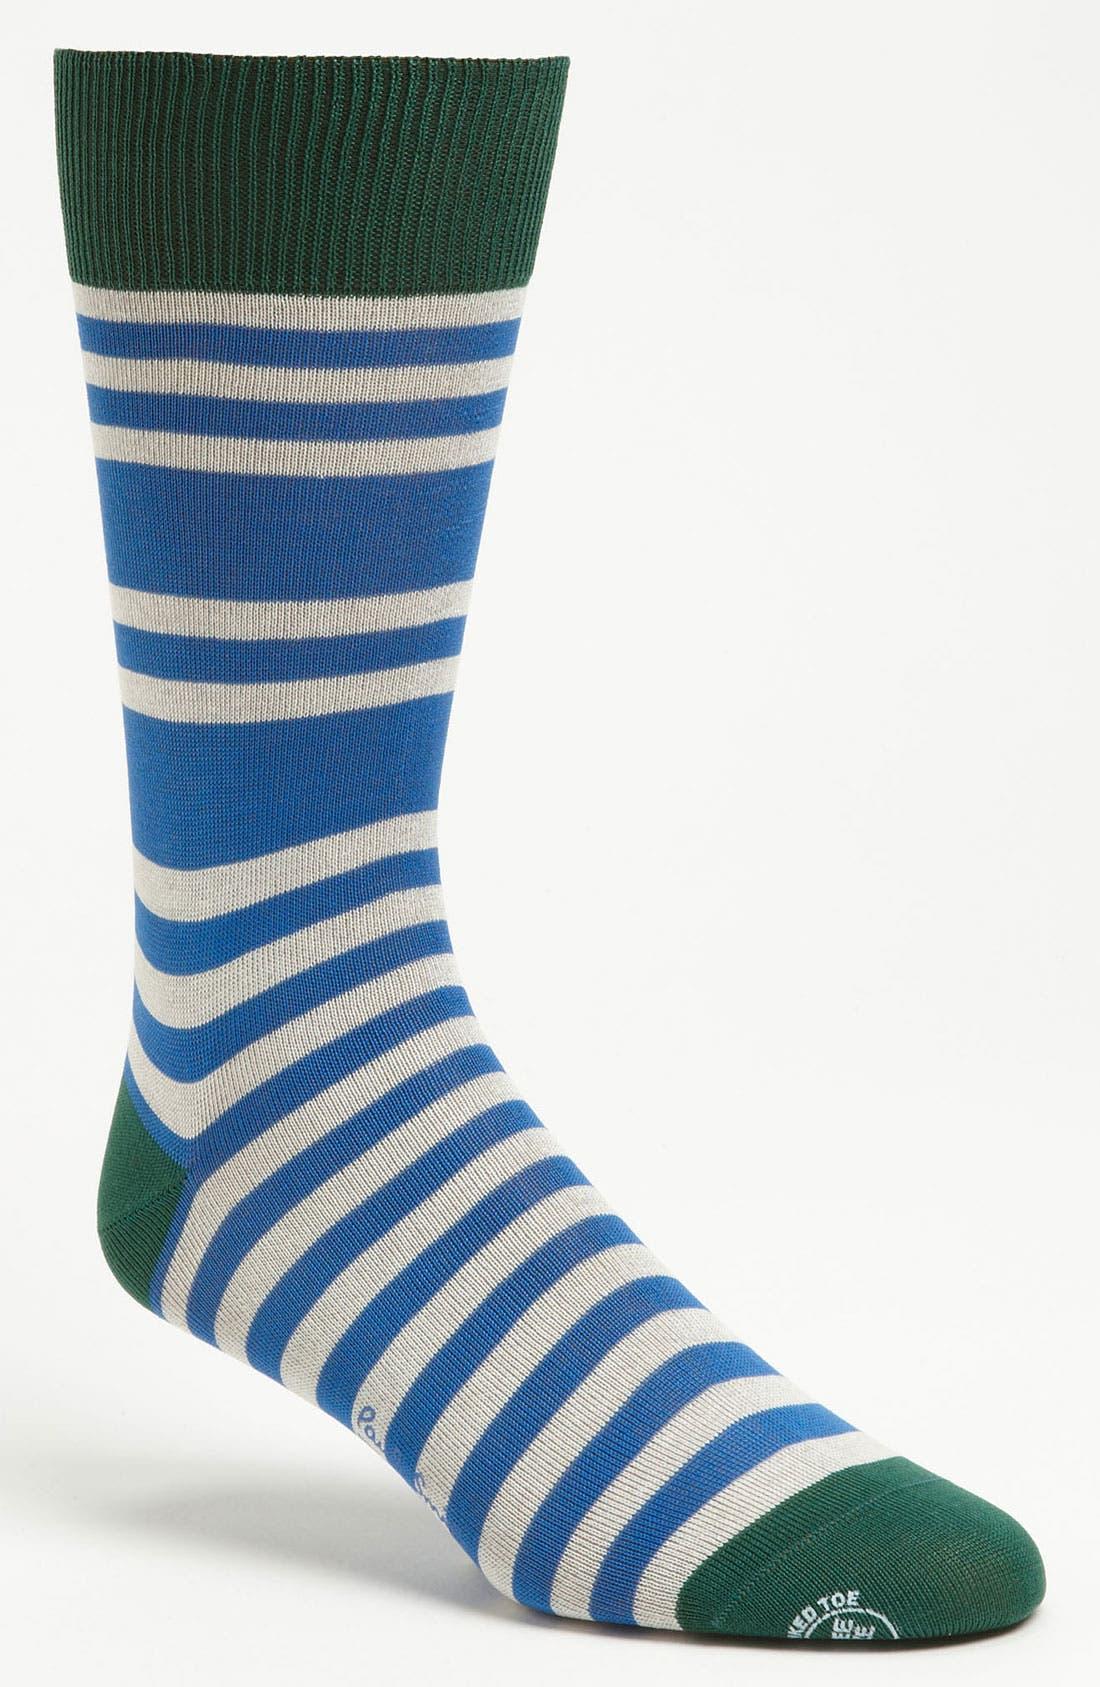 Main Image - Paul Smith Accessories 'Odd Bizmark' Socks